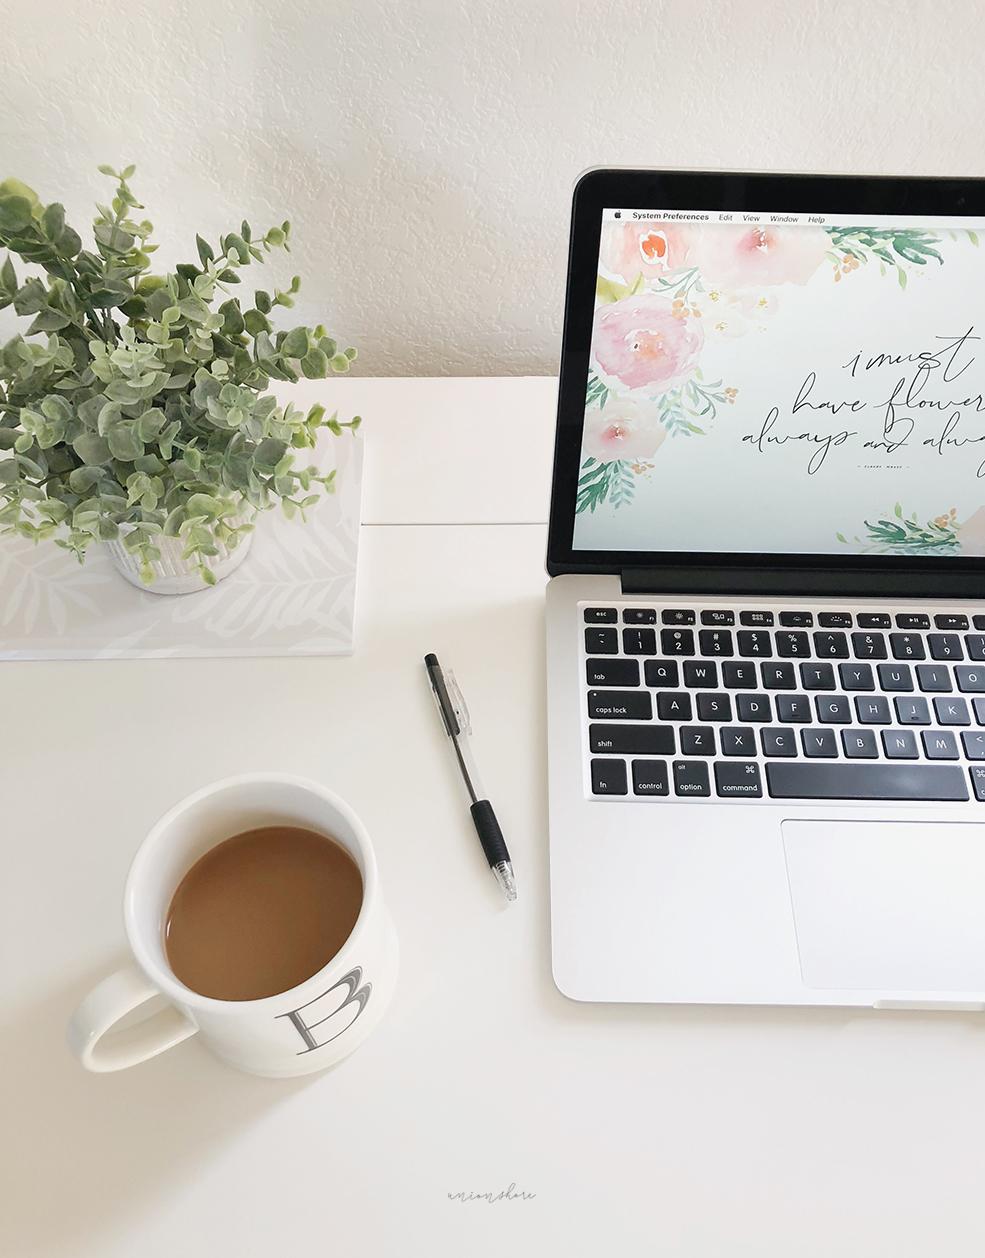 Free Download - Spring Floral Desktop Wallpaper - Union Shore Blog